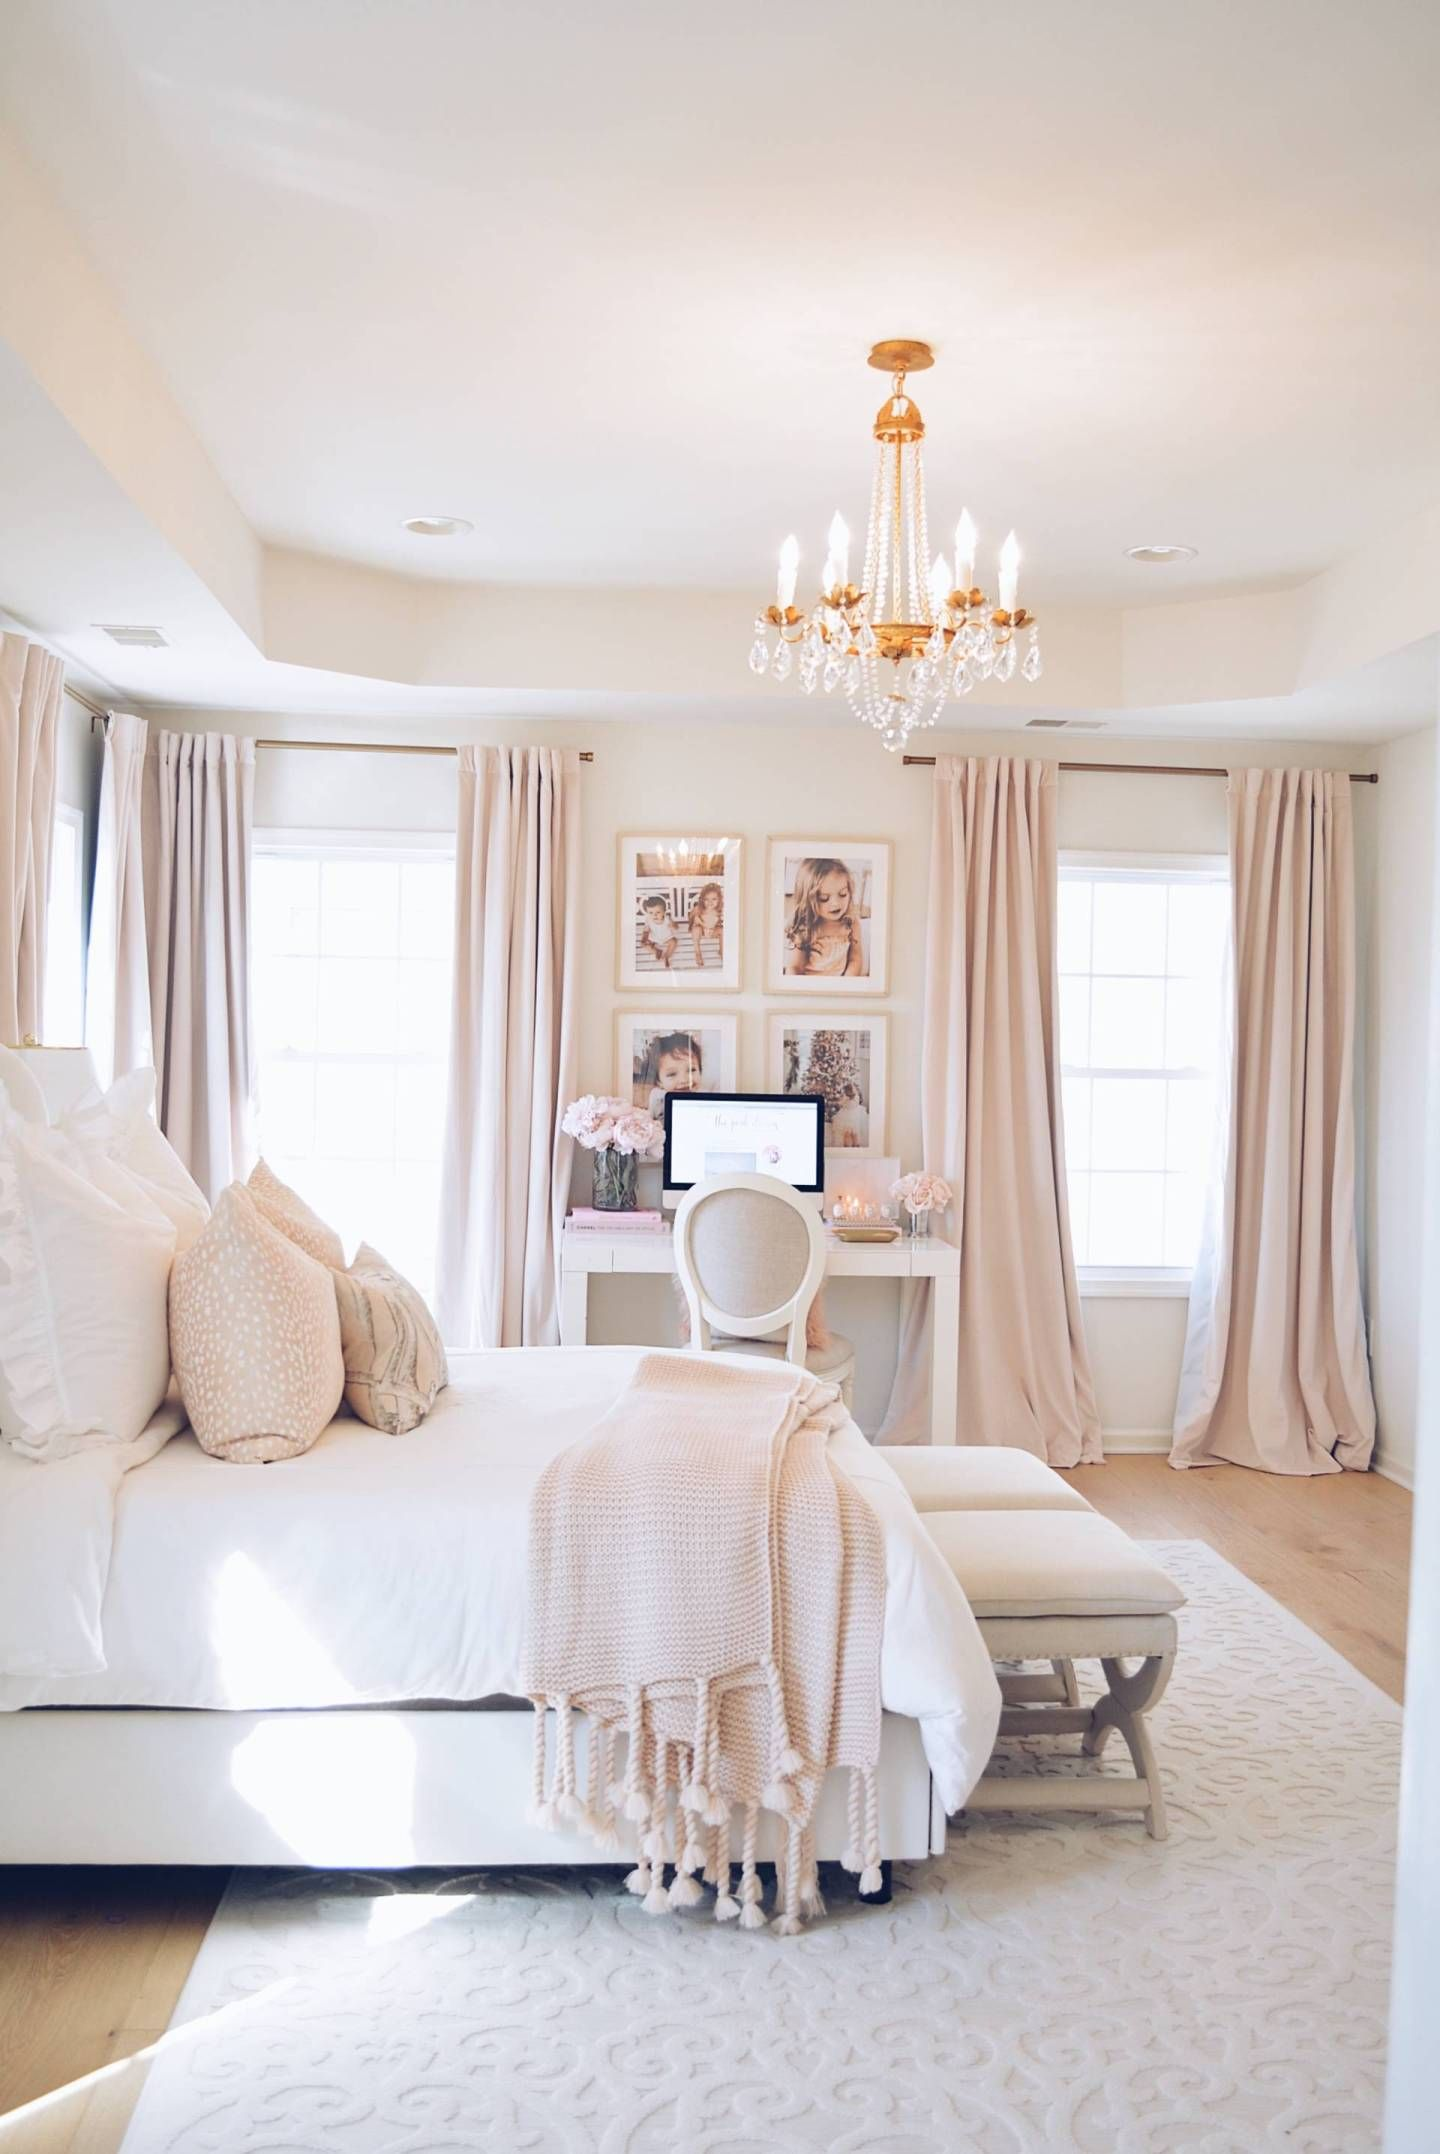 Amazon Home Decor Favorites - The Pink Dream